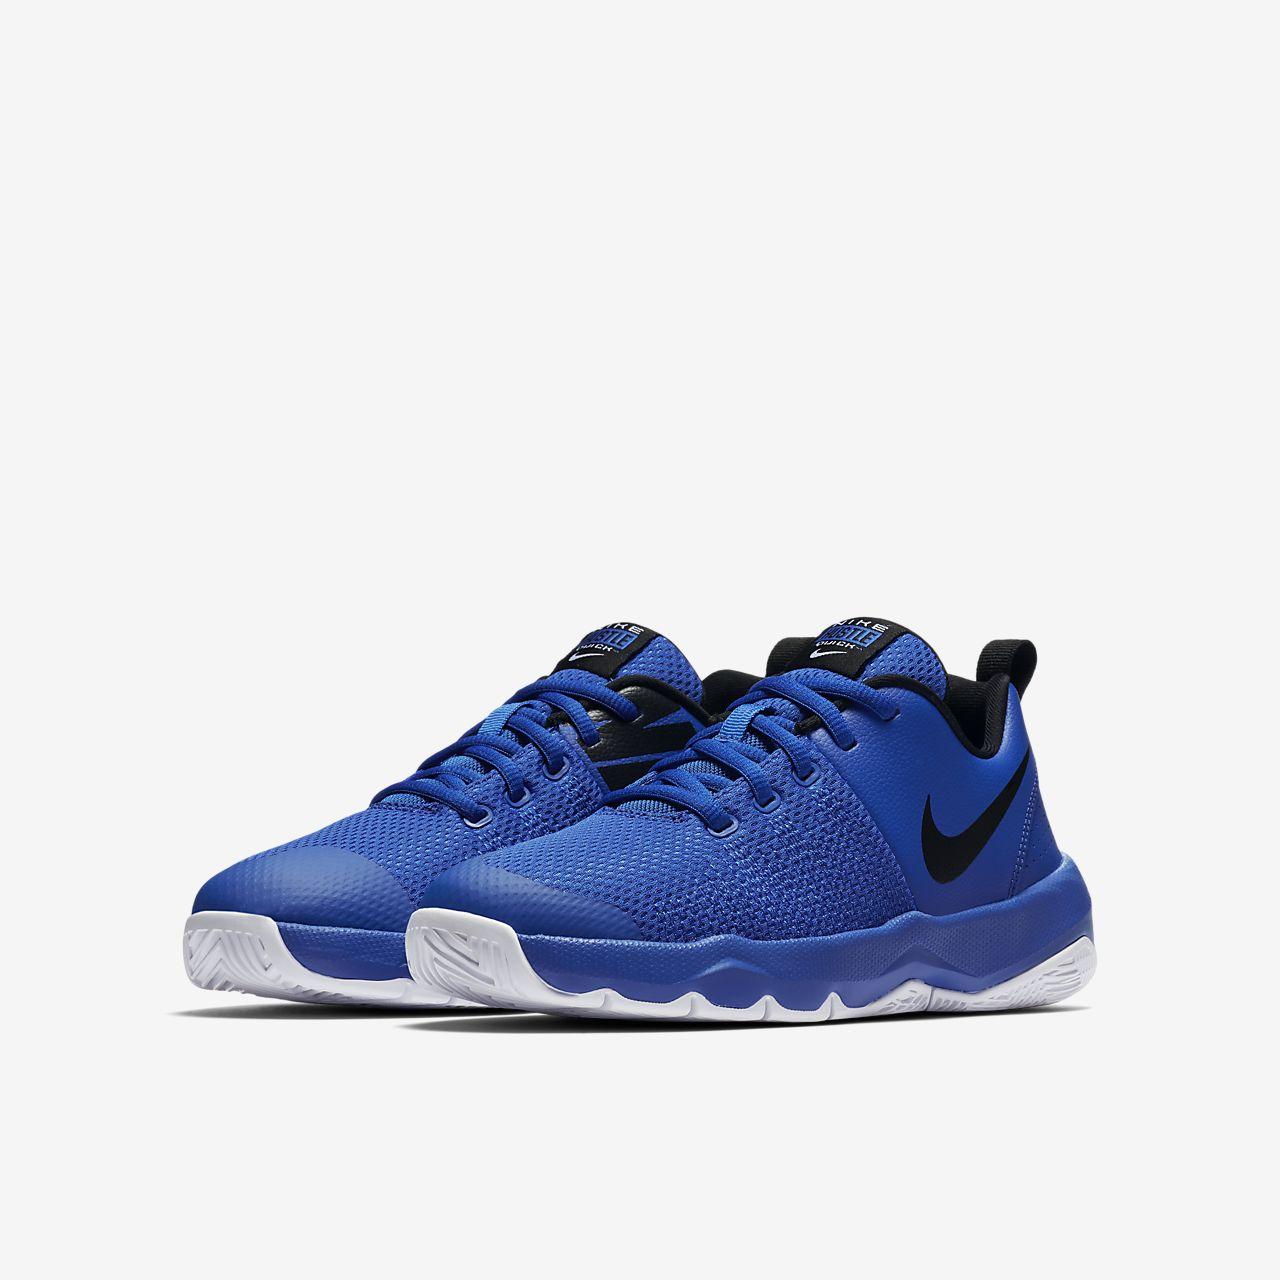 quality design 7eaf0 a8d8c ... Nike Team Hustle Quick Big Kids  Basketball Shoe